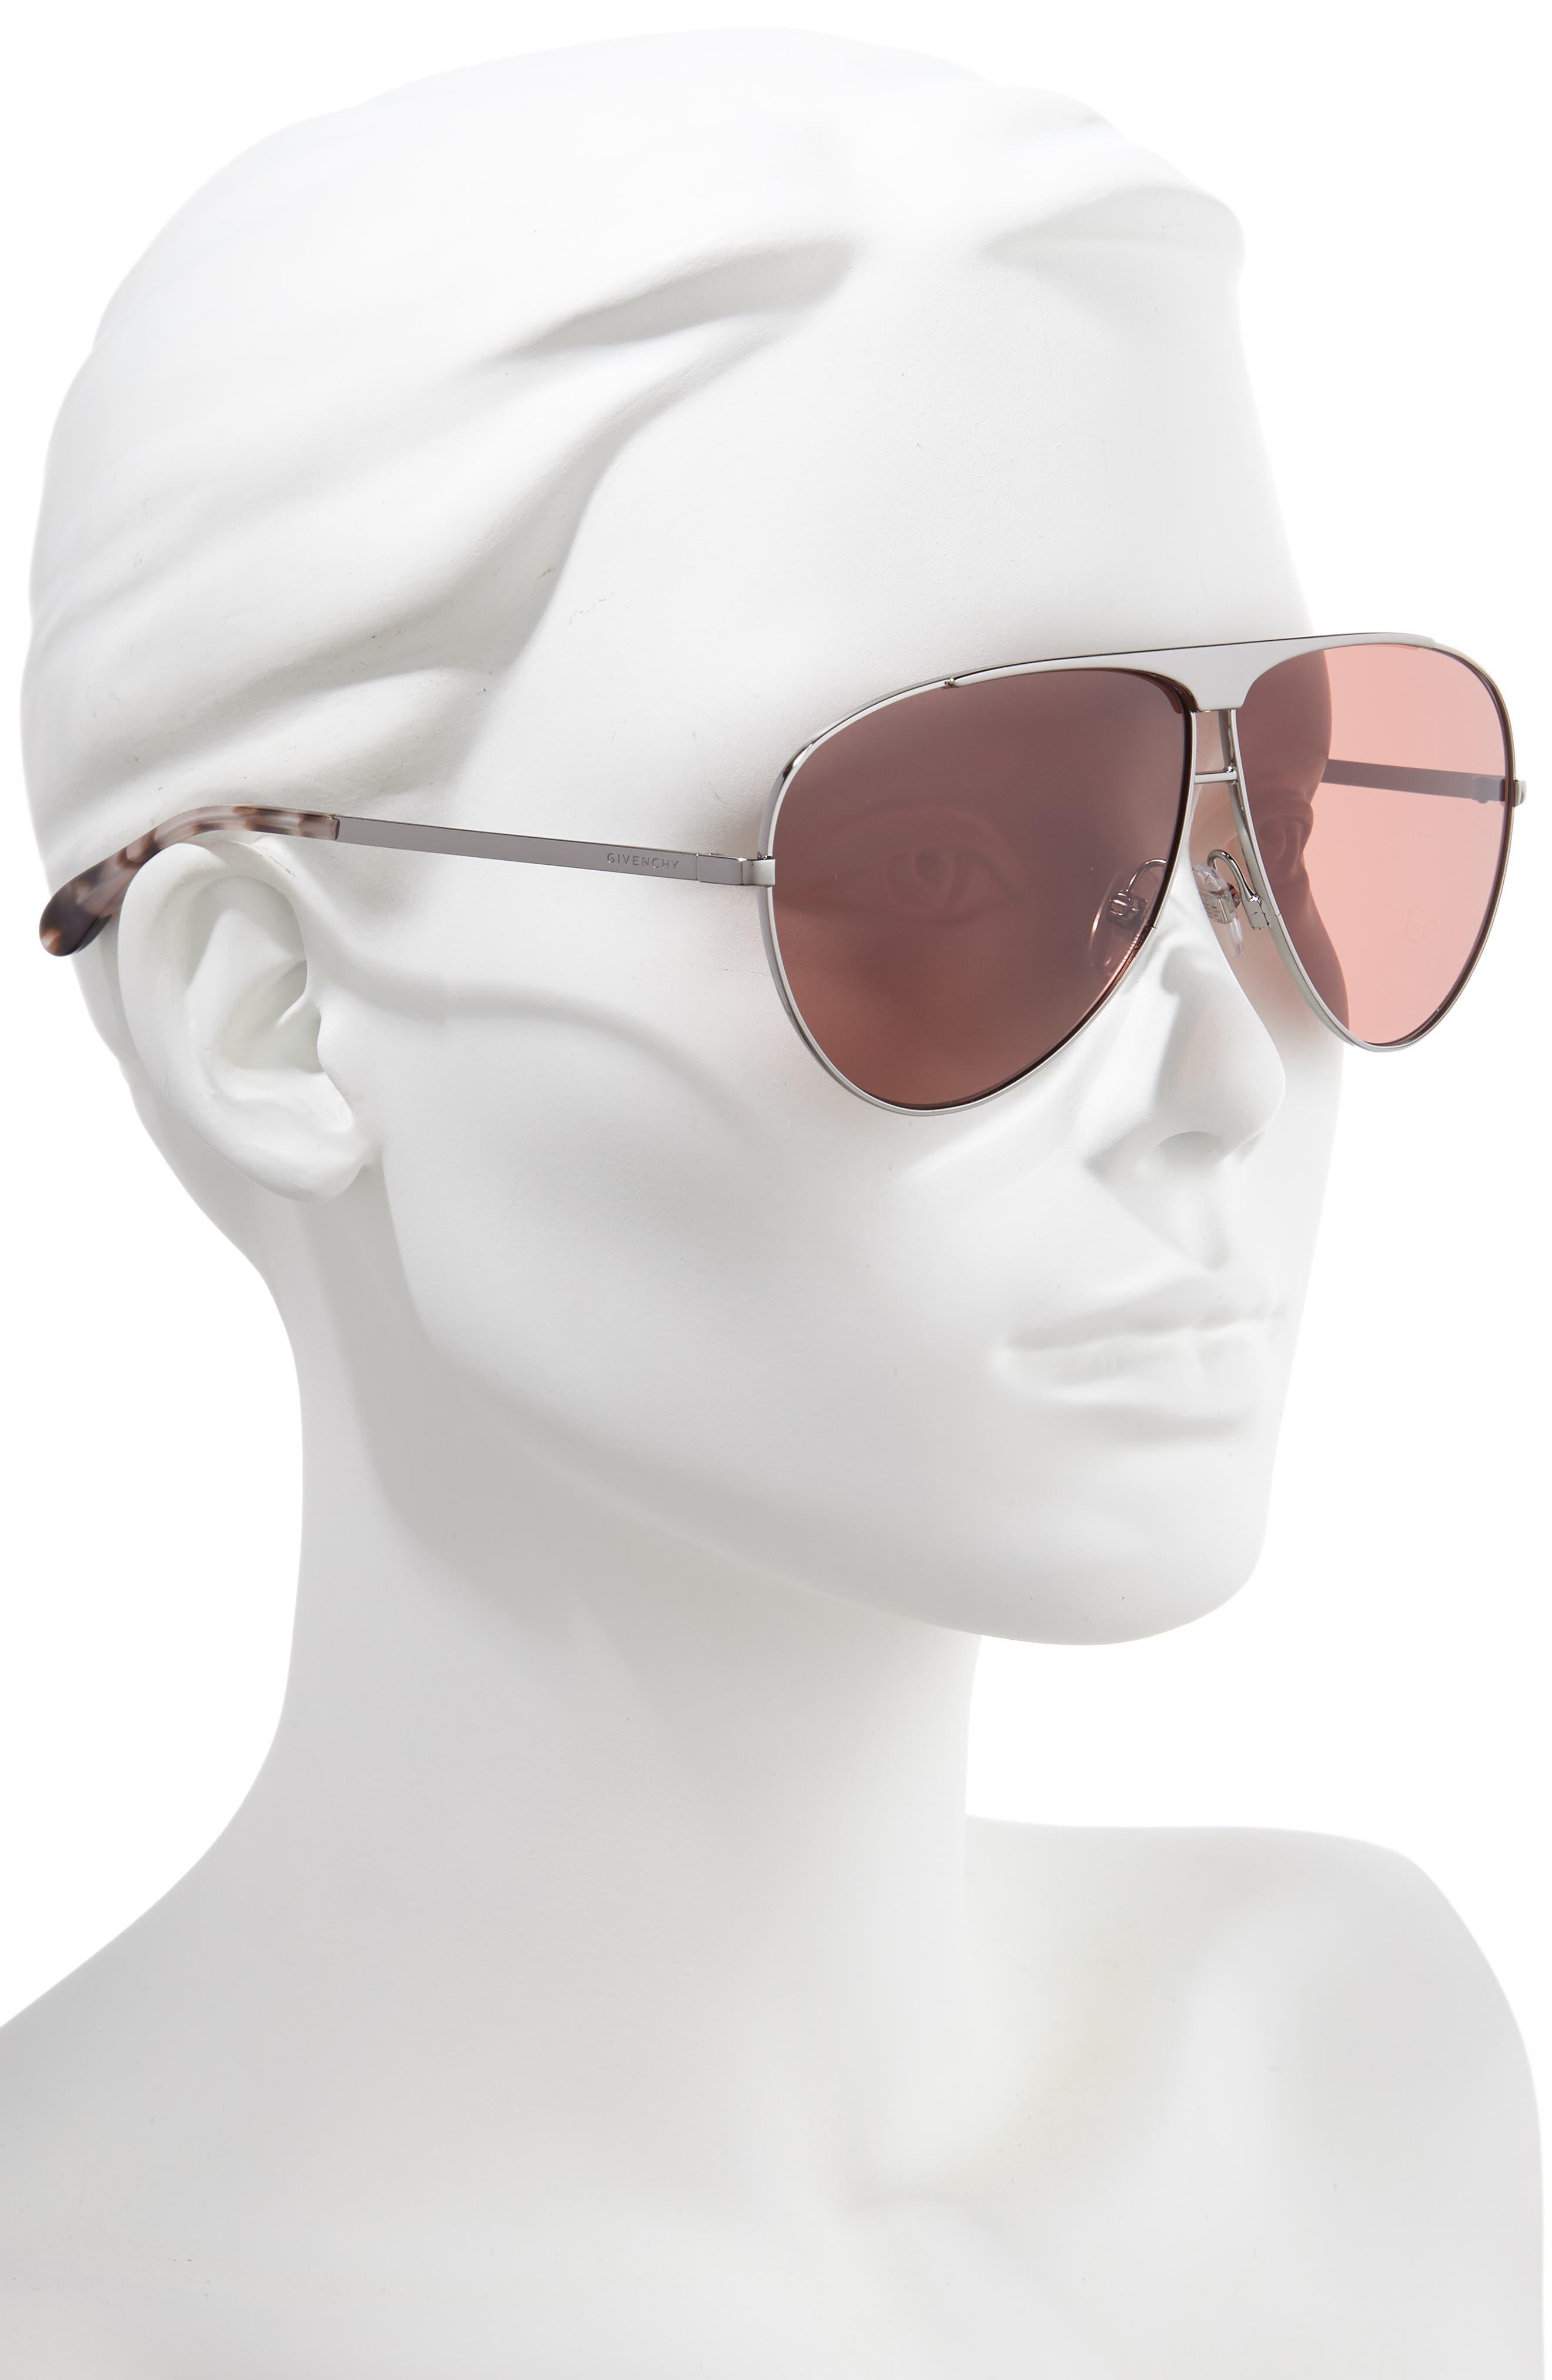 9704c98f8c Givenchy Aviator Sunglasses